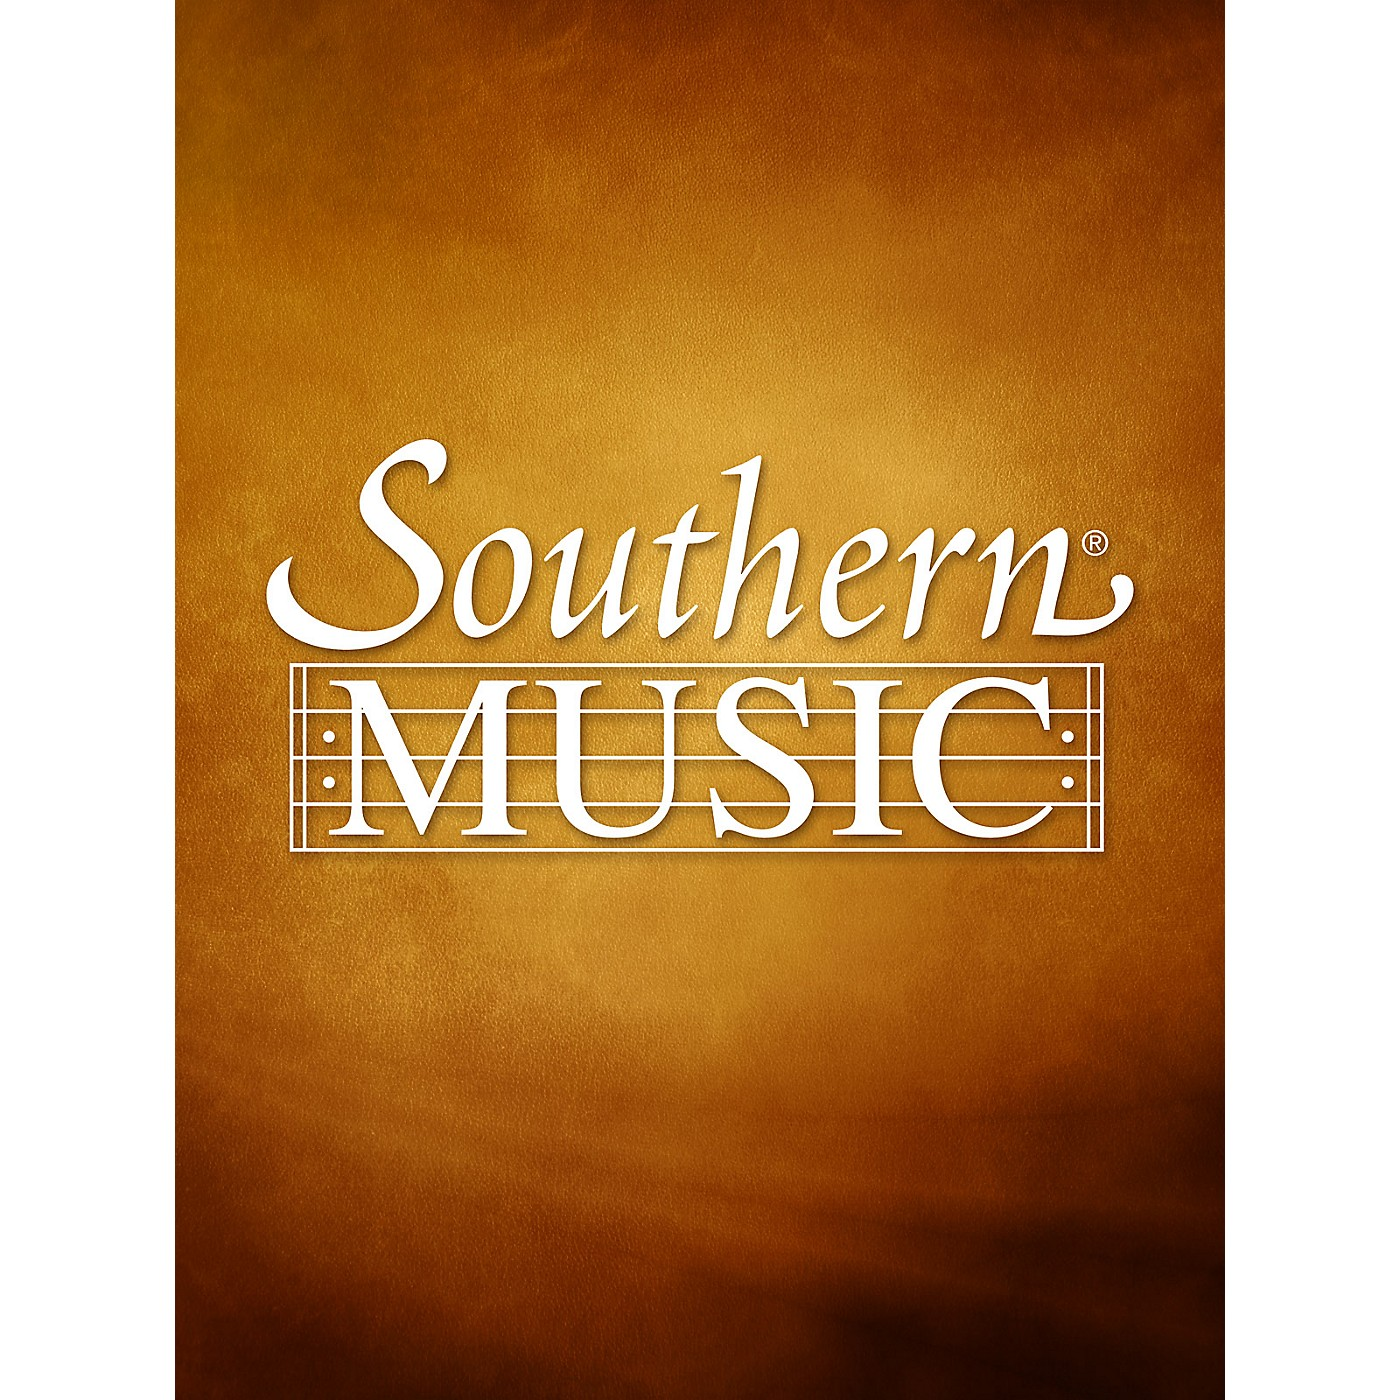 Southern La Sorella (Band/Concert Band Music) Concert Band Level 4 Arranged by Richard E. Thurston thumbnail